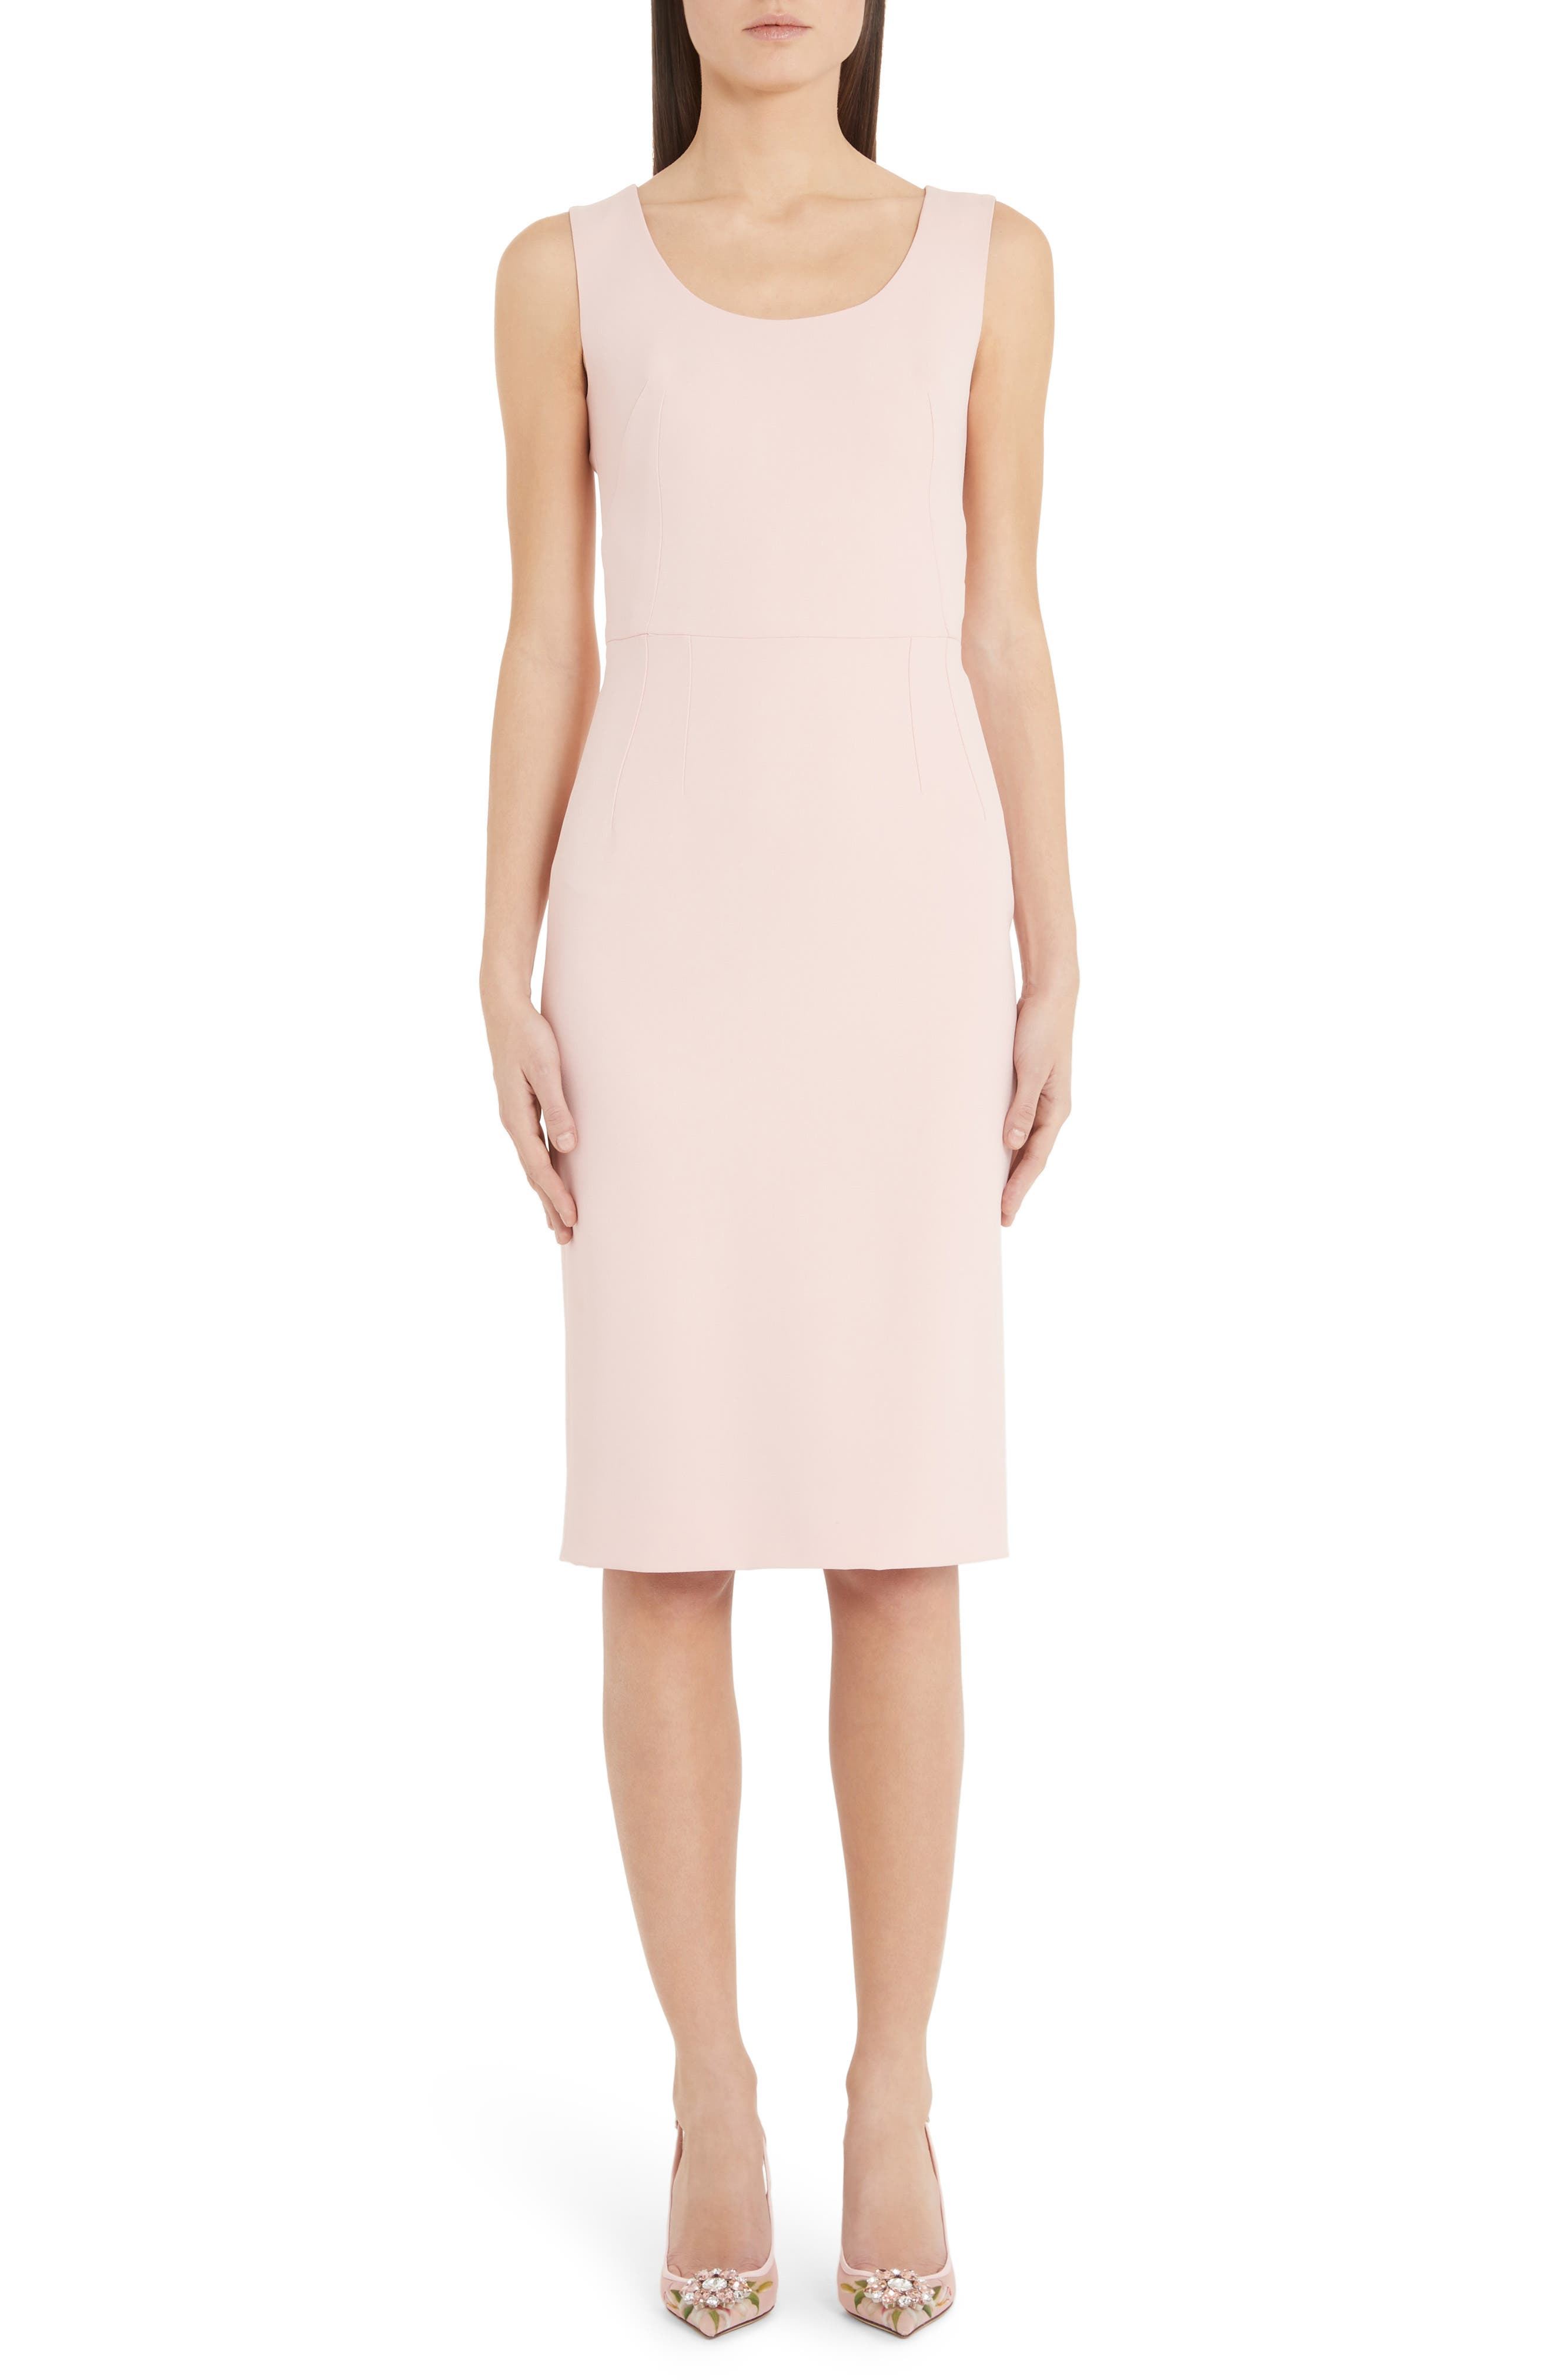 Dolce & gabbana Scoop Neck Sheath Dress, 50 IT - Pink